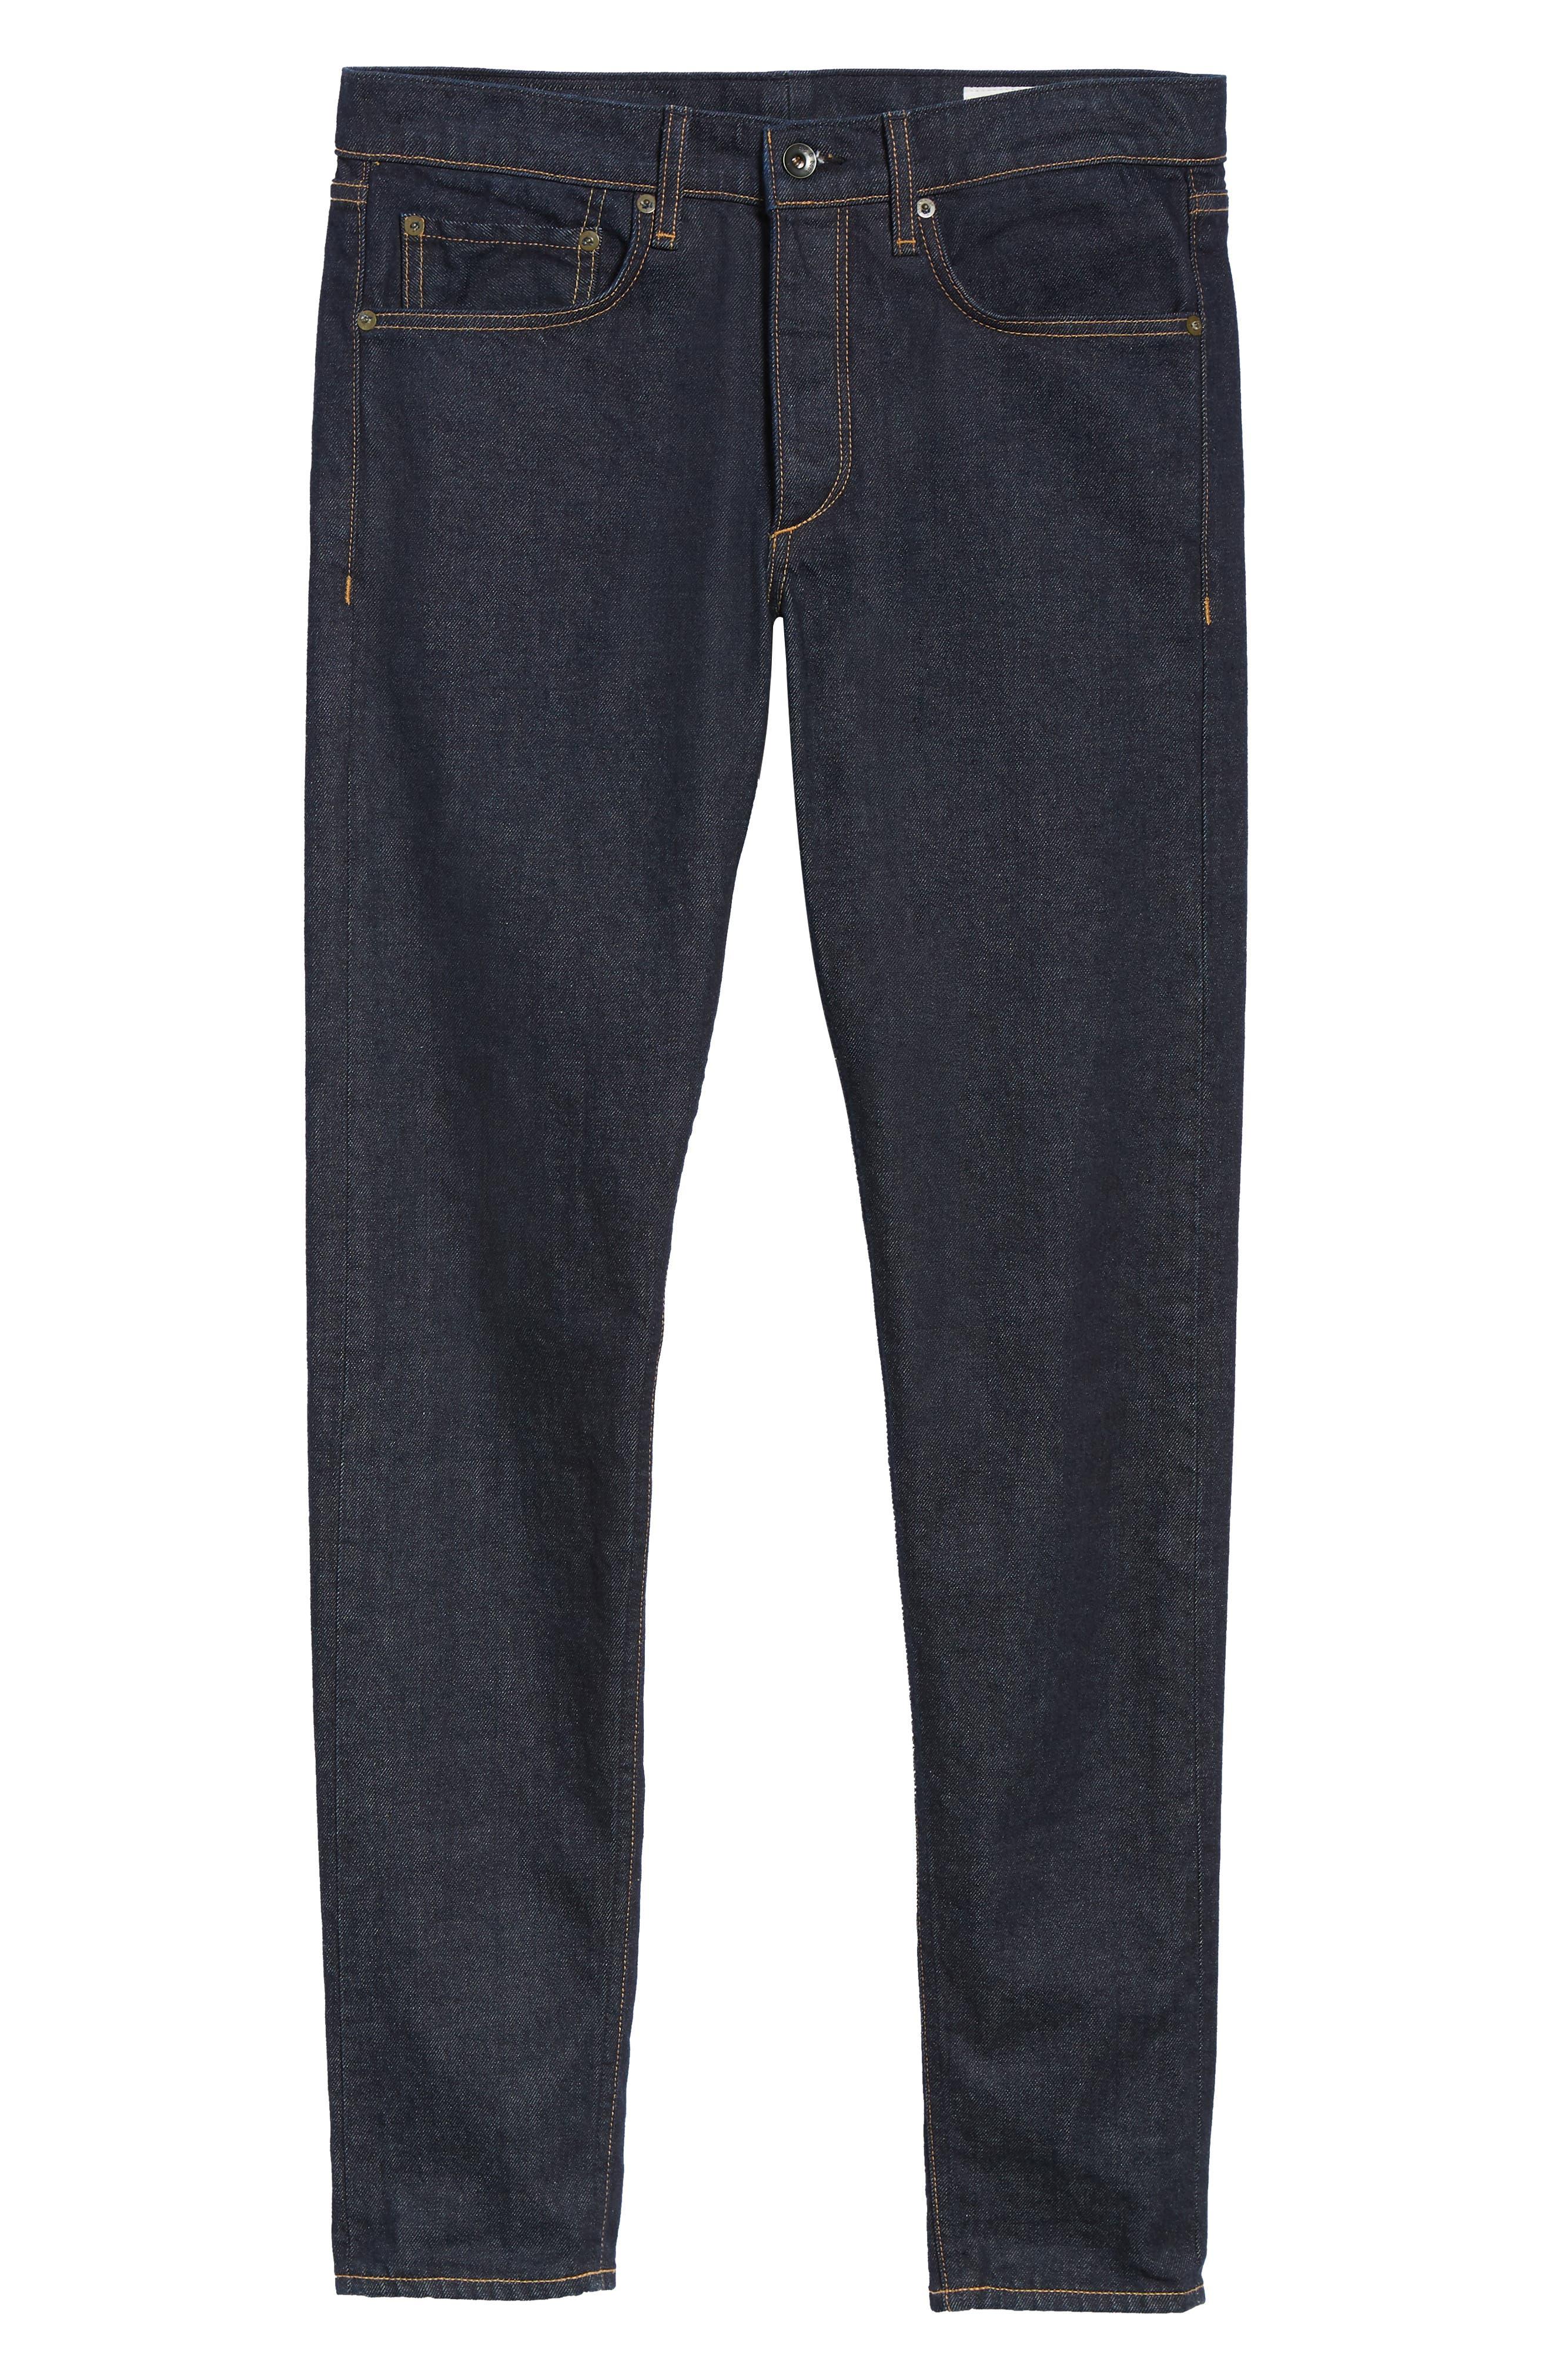 Fit 1 Skinny Fit Jeans,                             Alternate thumbnail 6, color,                             INDIGO RINSE SELVEDGE